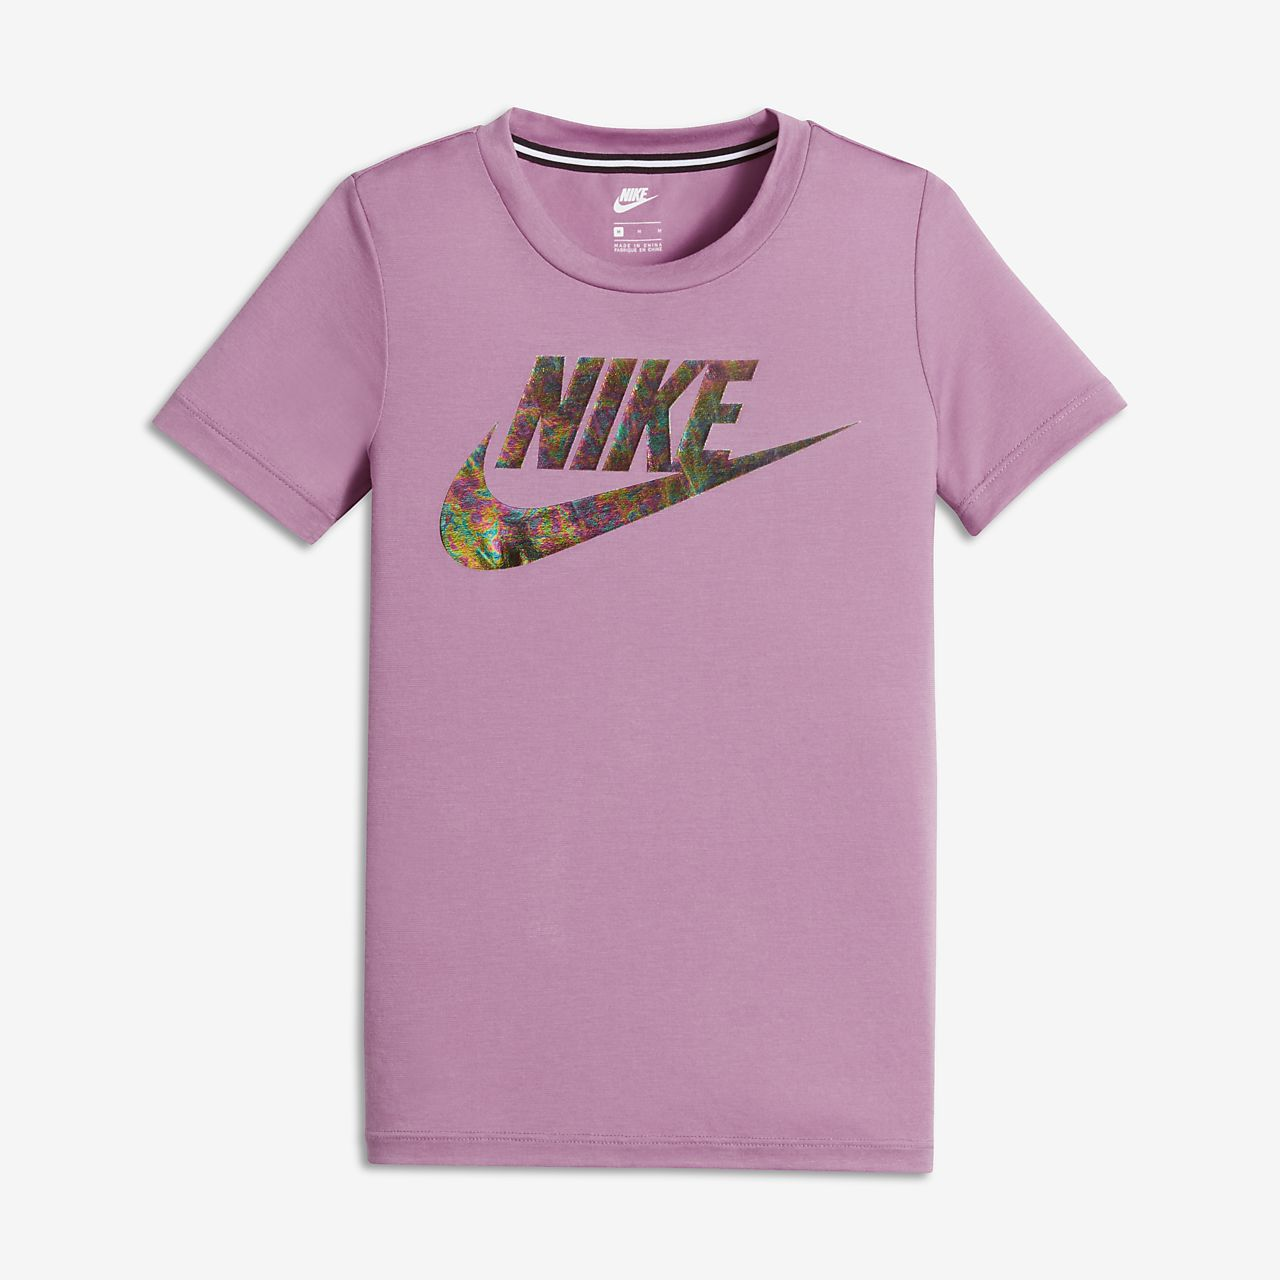 Nike Sportswear Essential Big Kids' Short Sleeve Tops Orchid